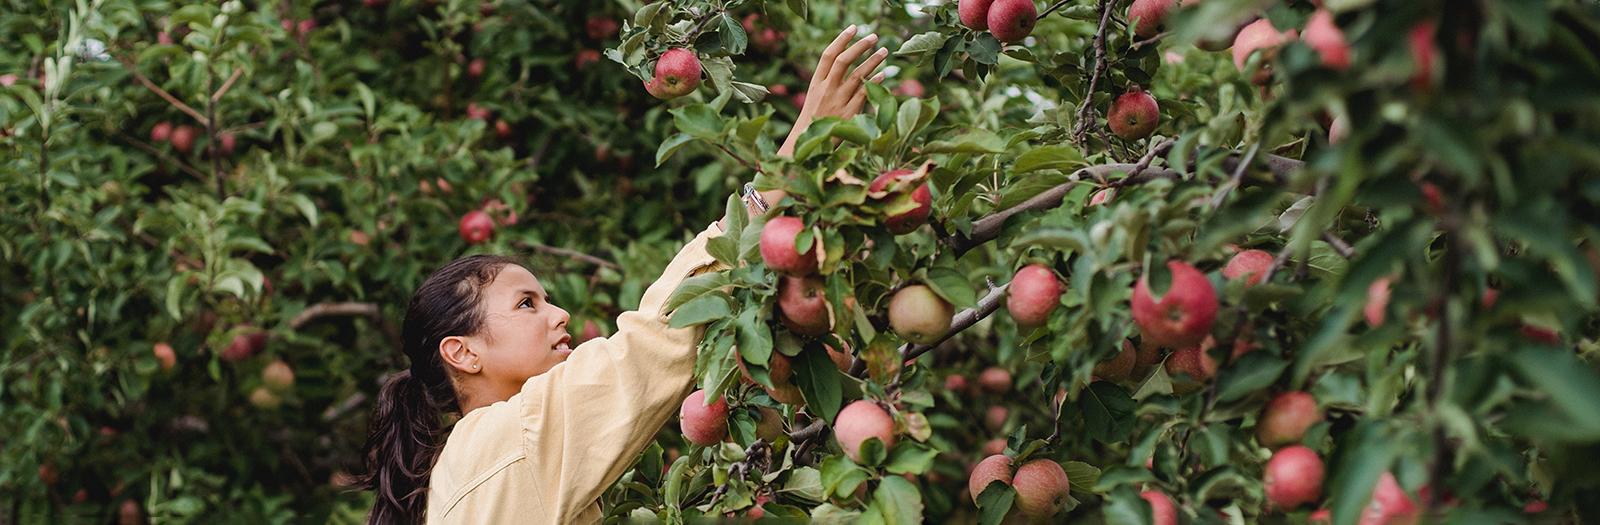 girl picking an apple